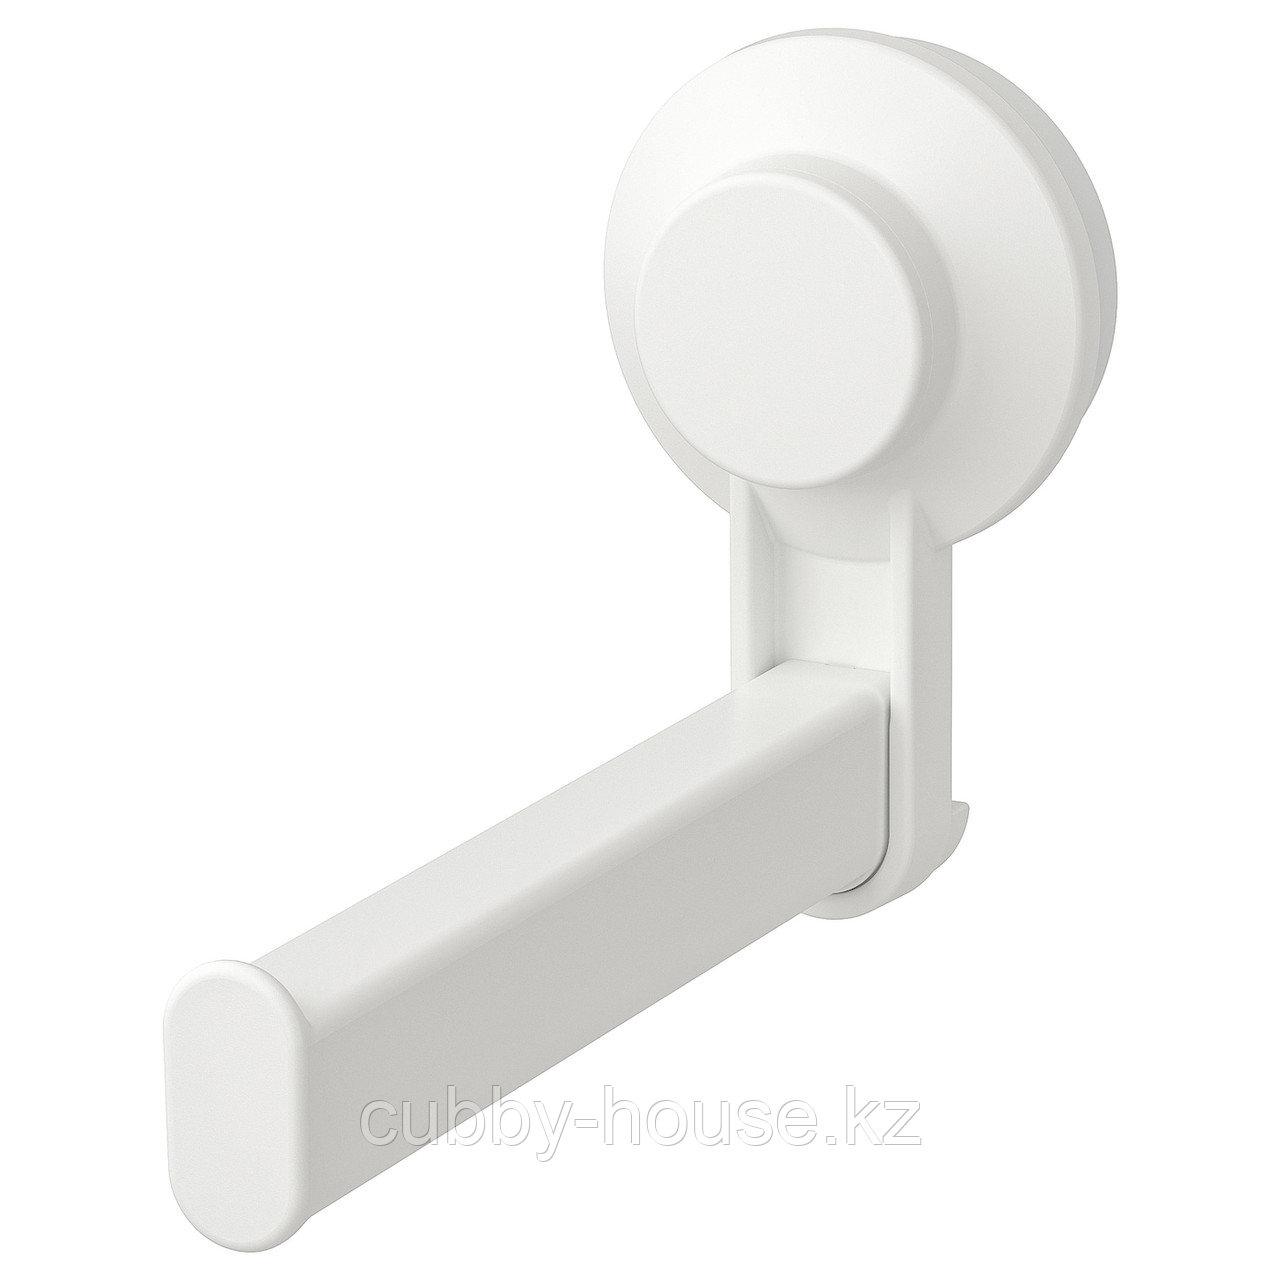 ТИСКЕН Держатель туалетн бумаги н/присоске, белый